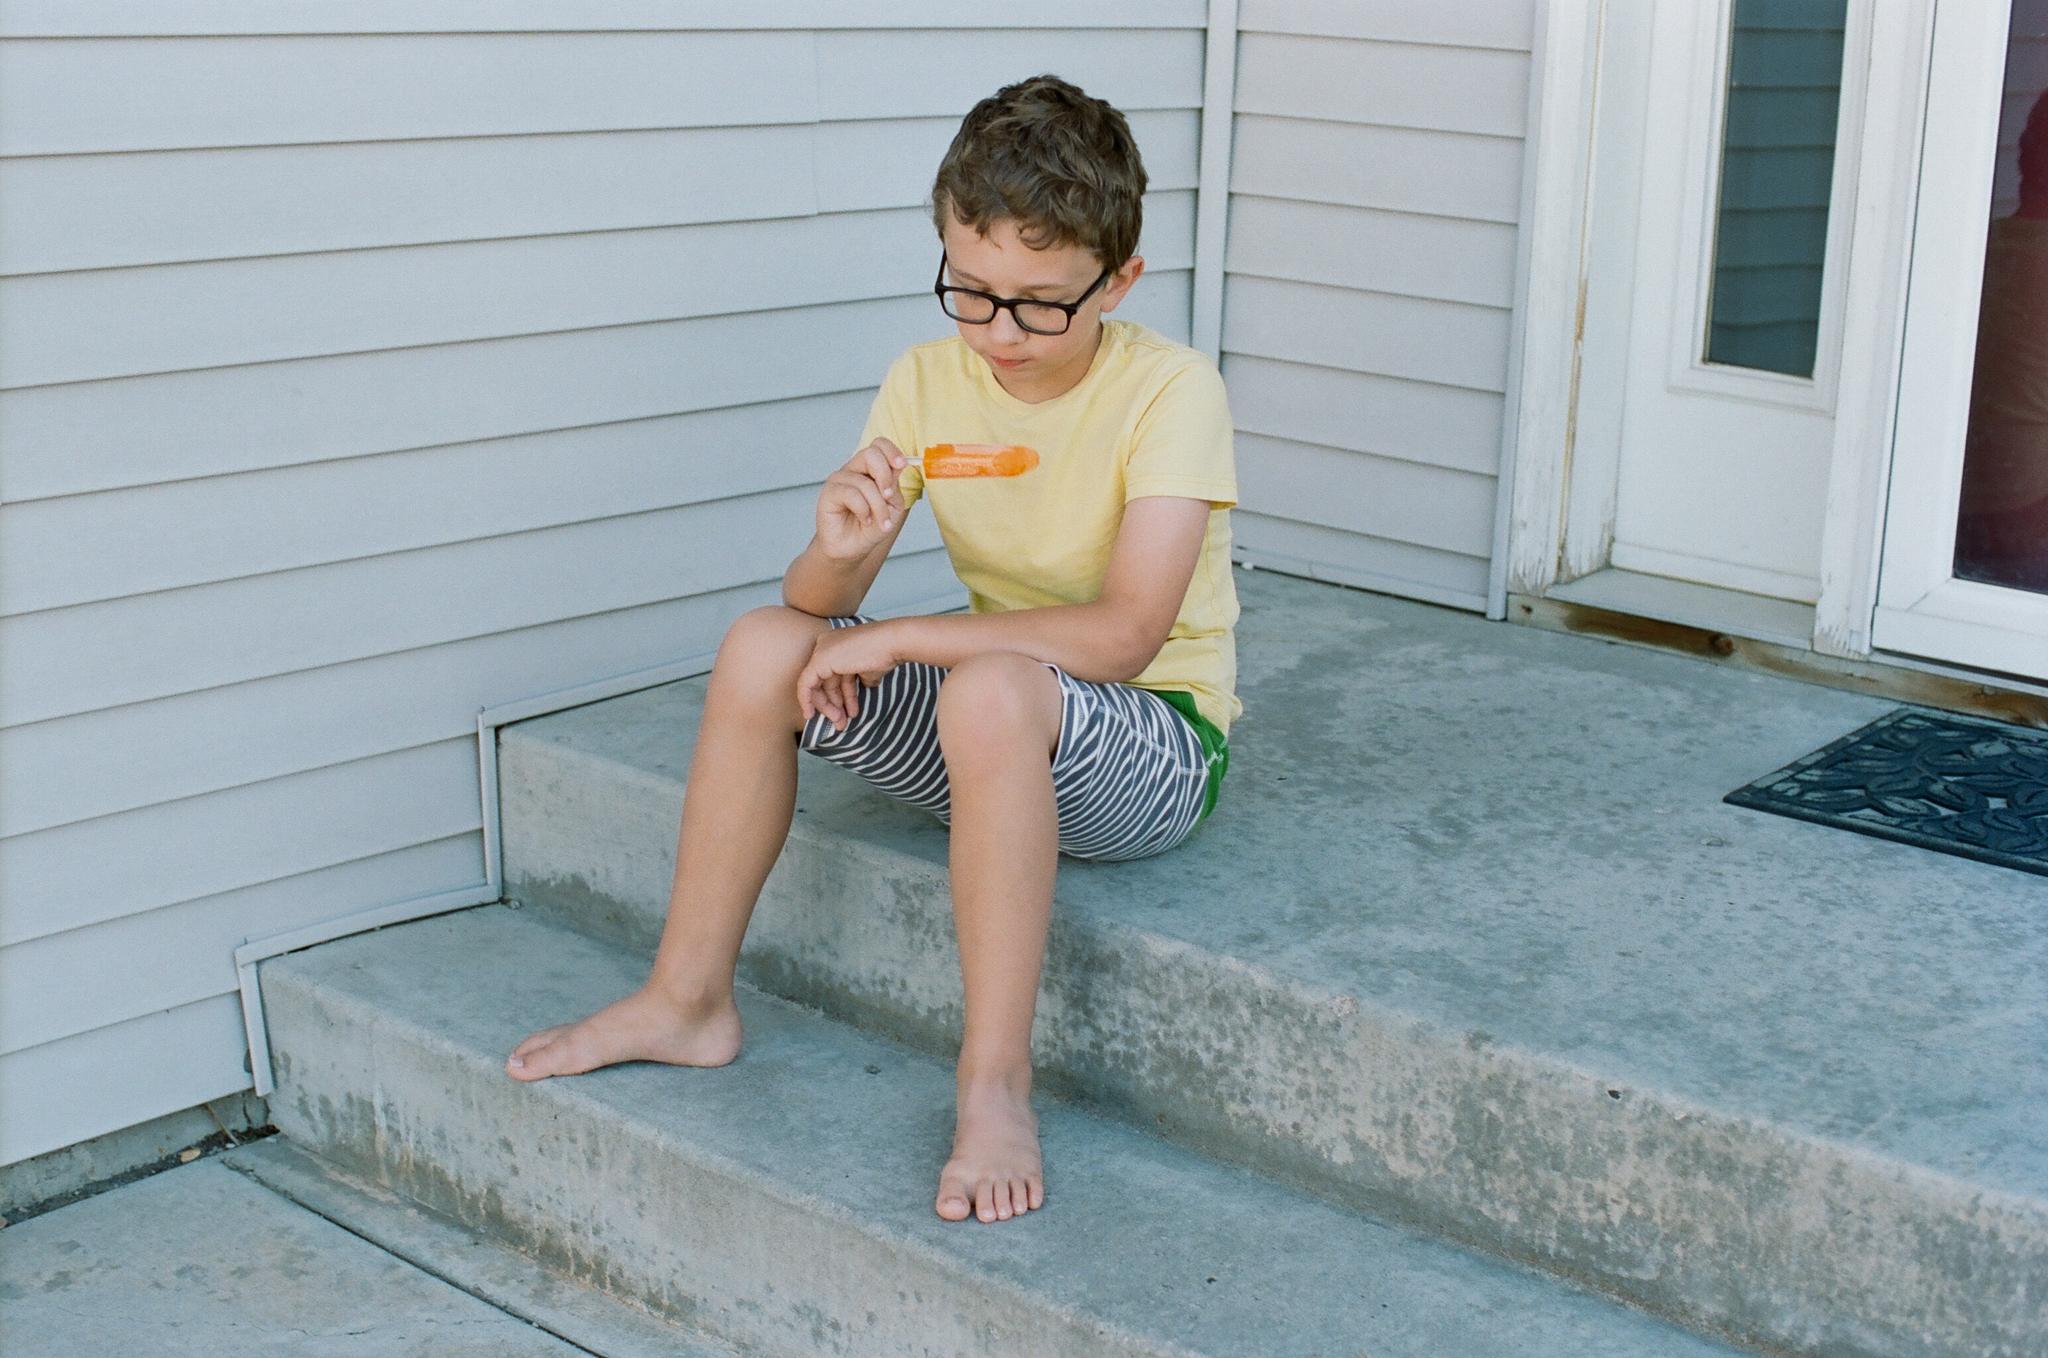 Boy eating orange popsicle